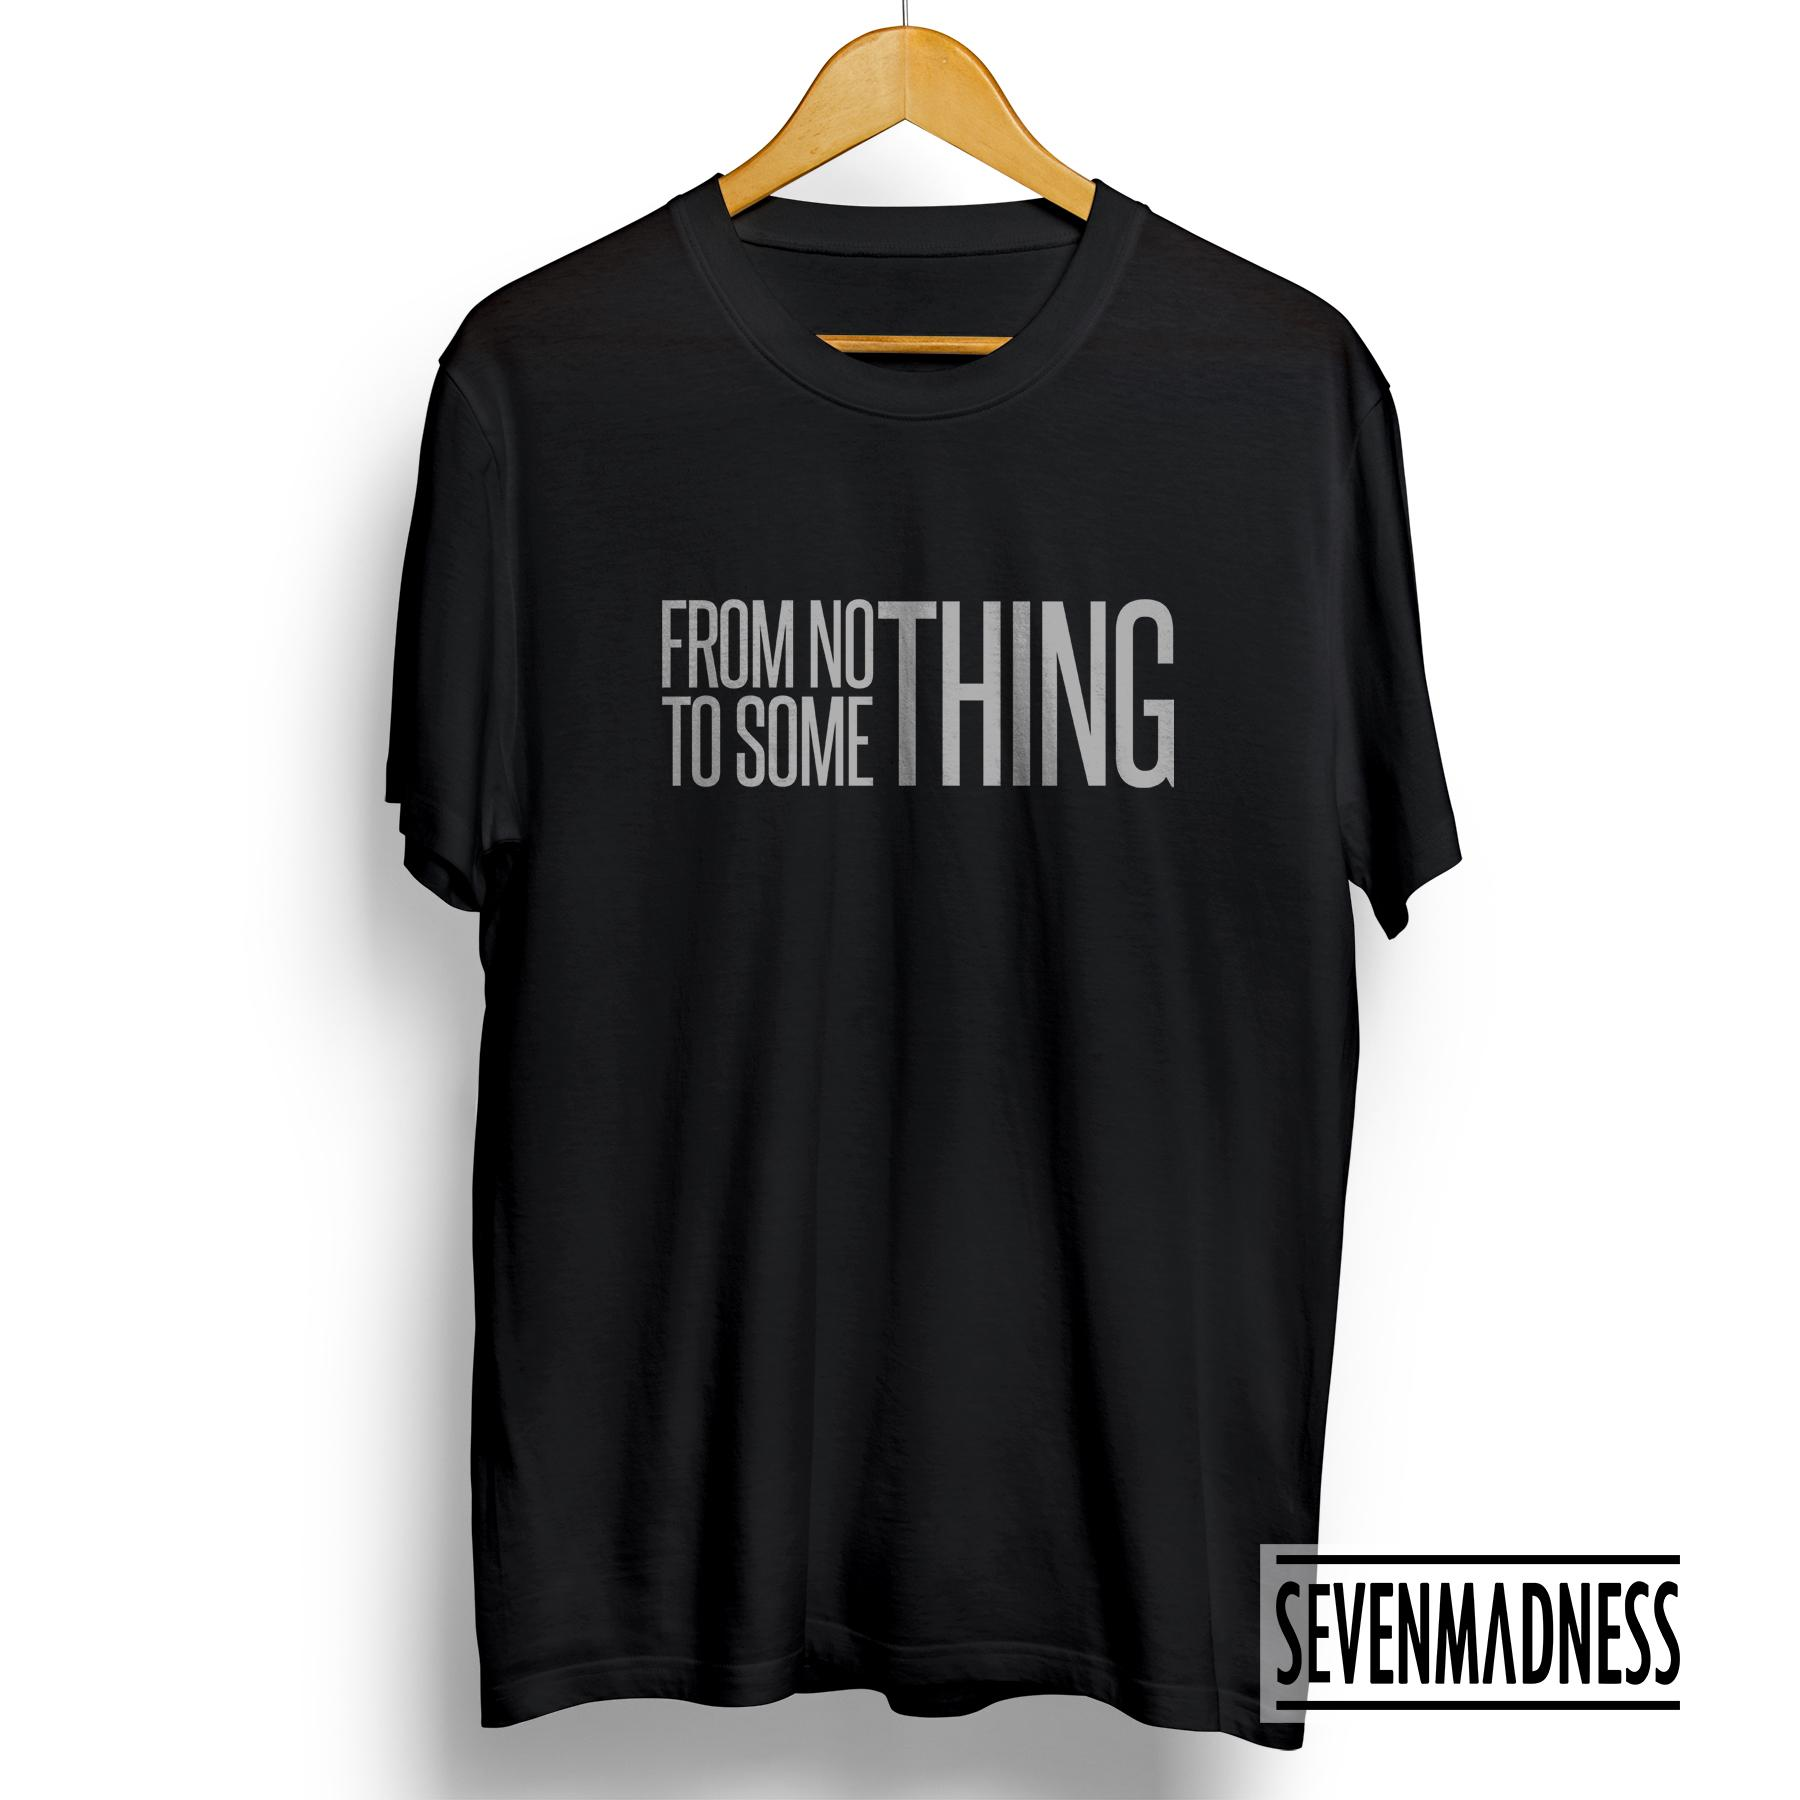 Kaos T-shirt Distro Tshirt Pria / Wanita - From Nothing To Something